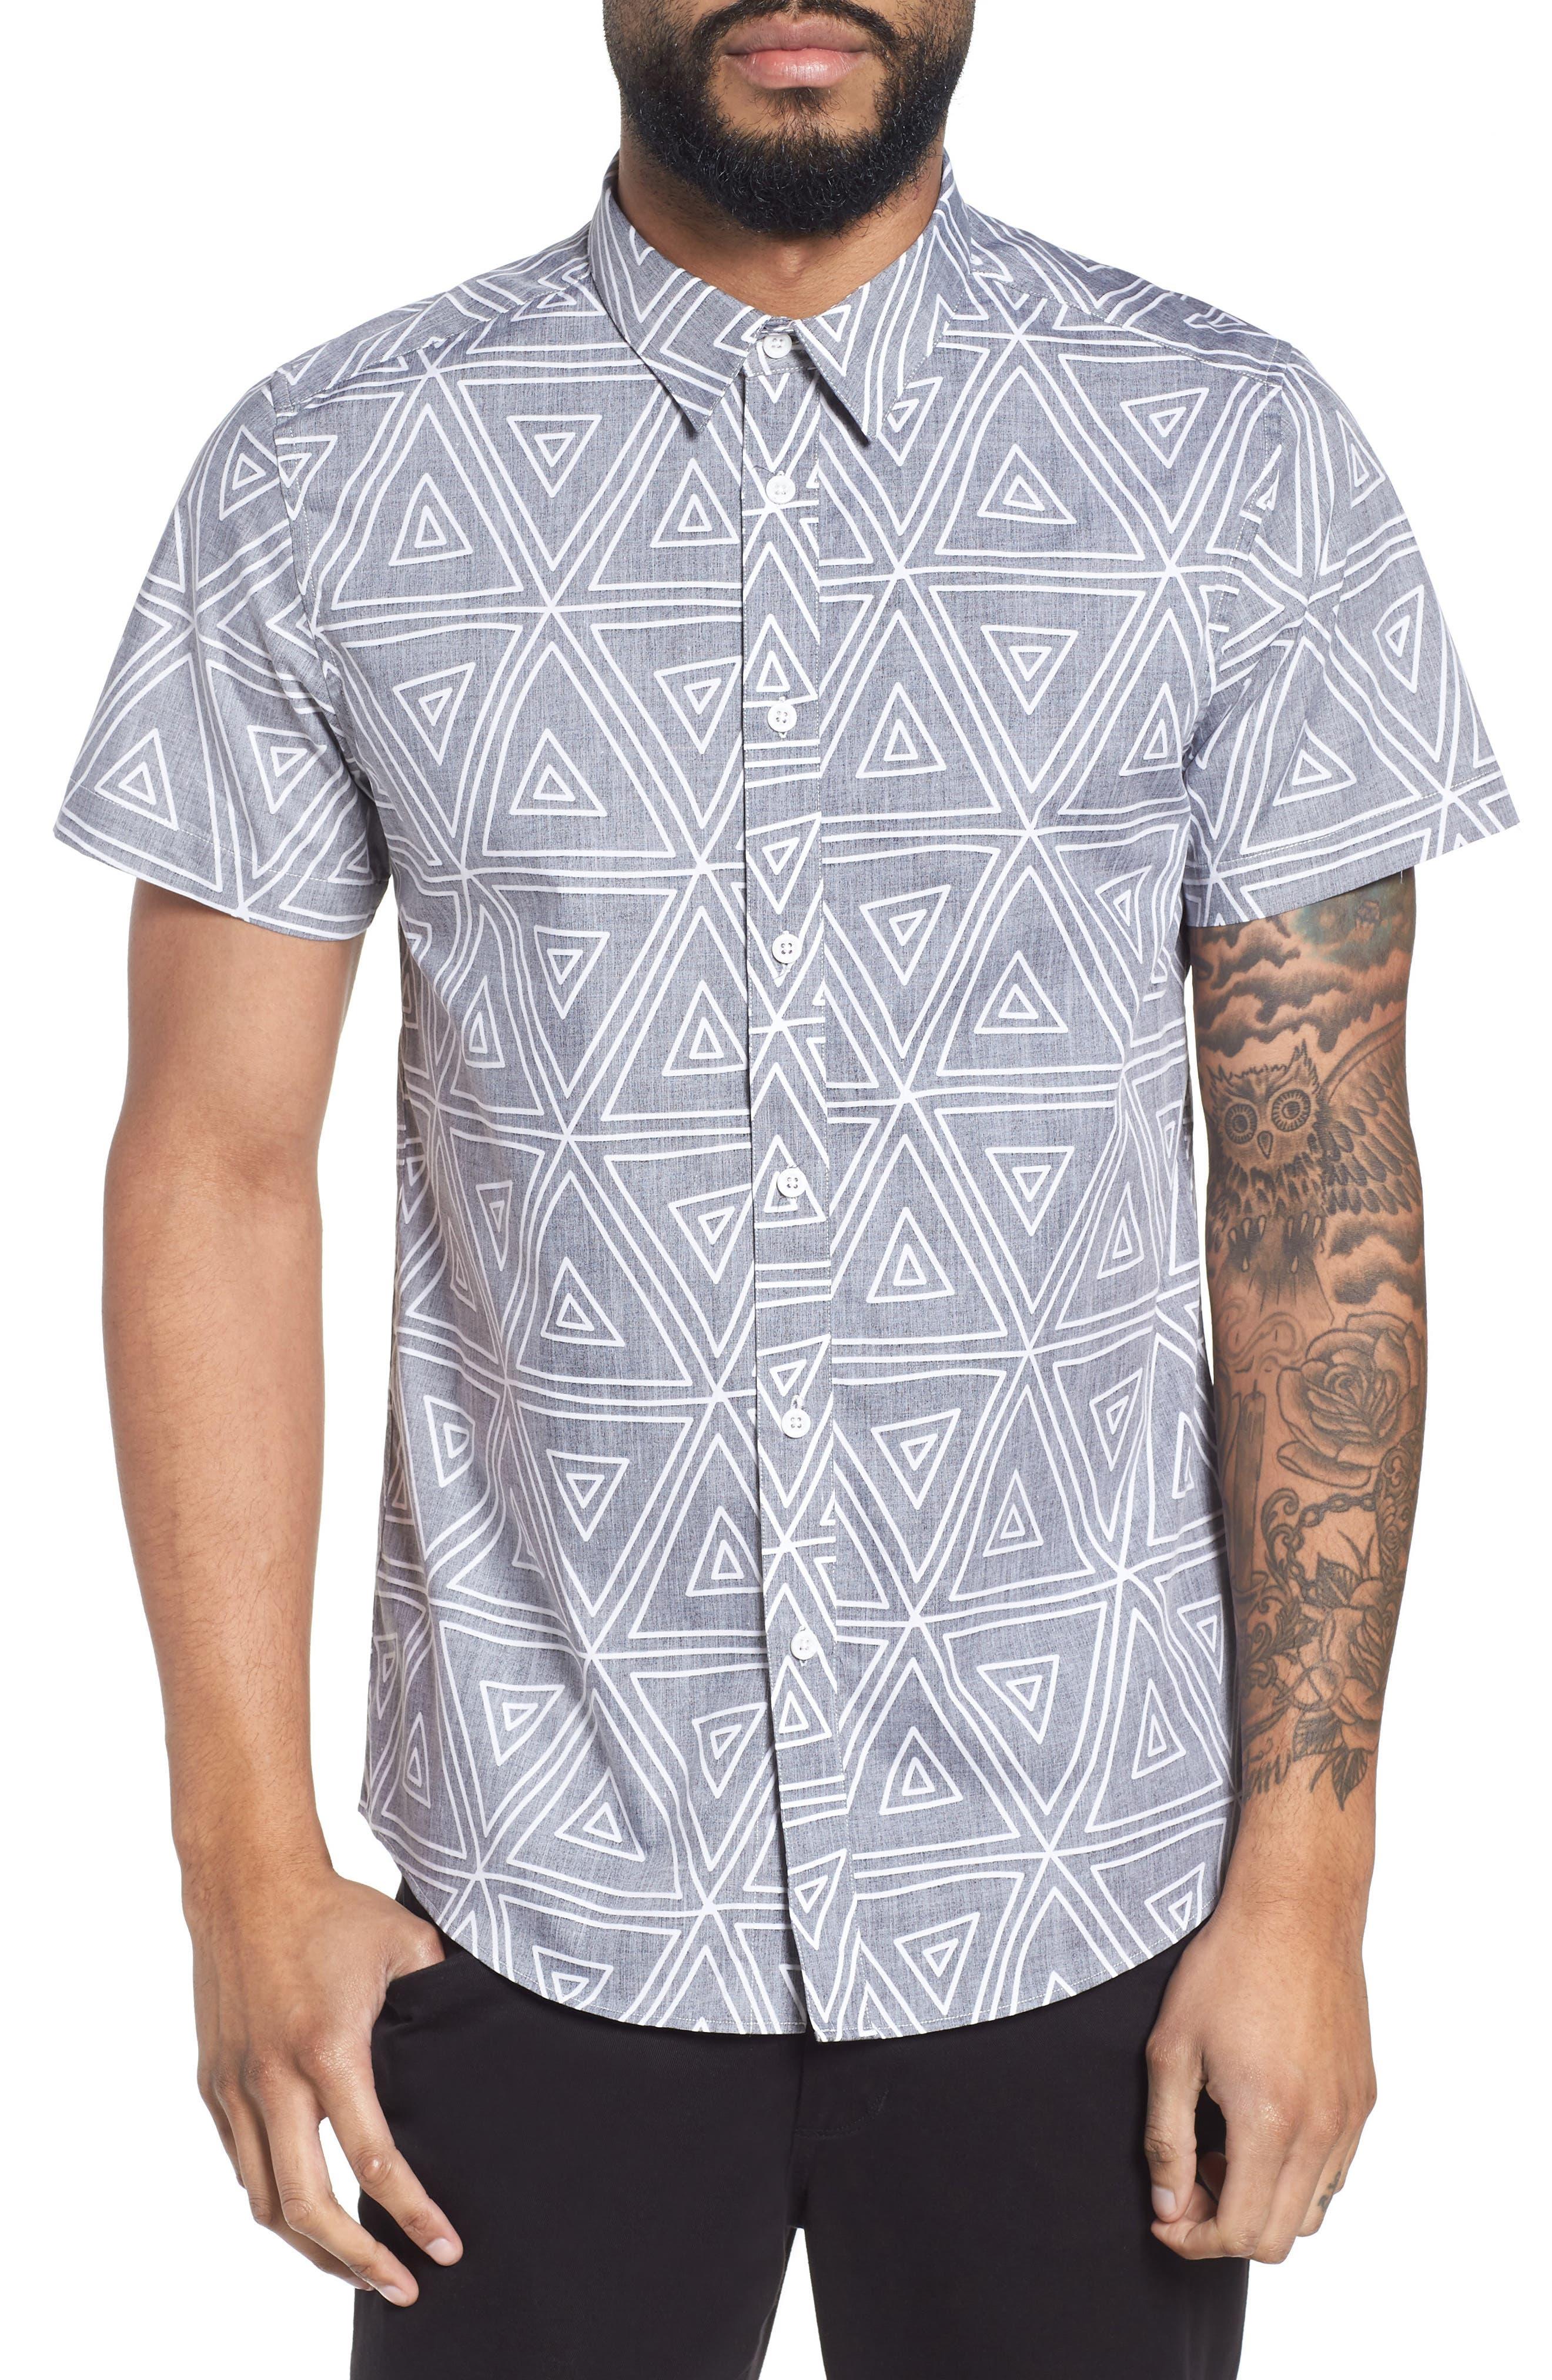 TWENTYMETRICTONS Geometric Woven Short Sleeve Shirt